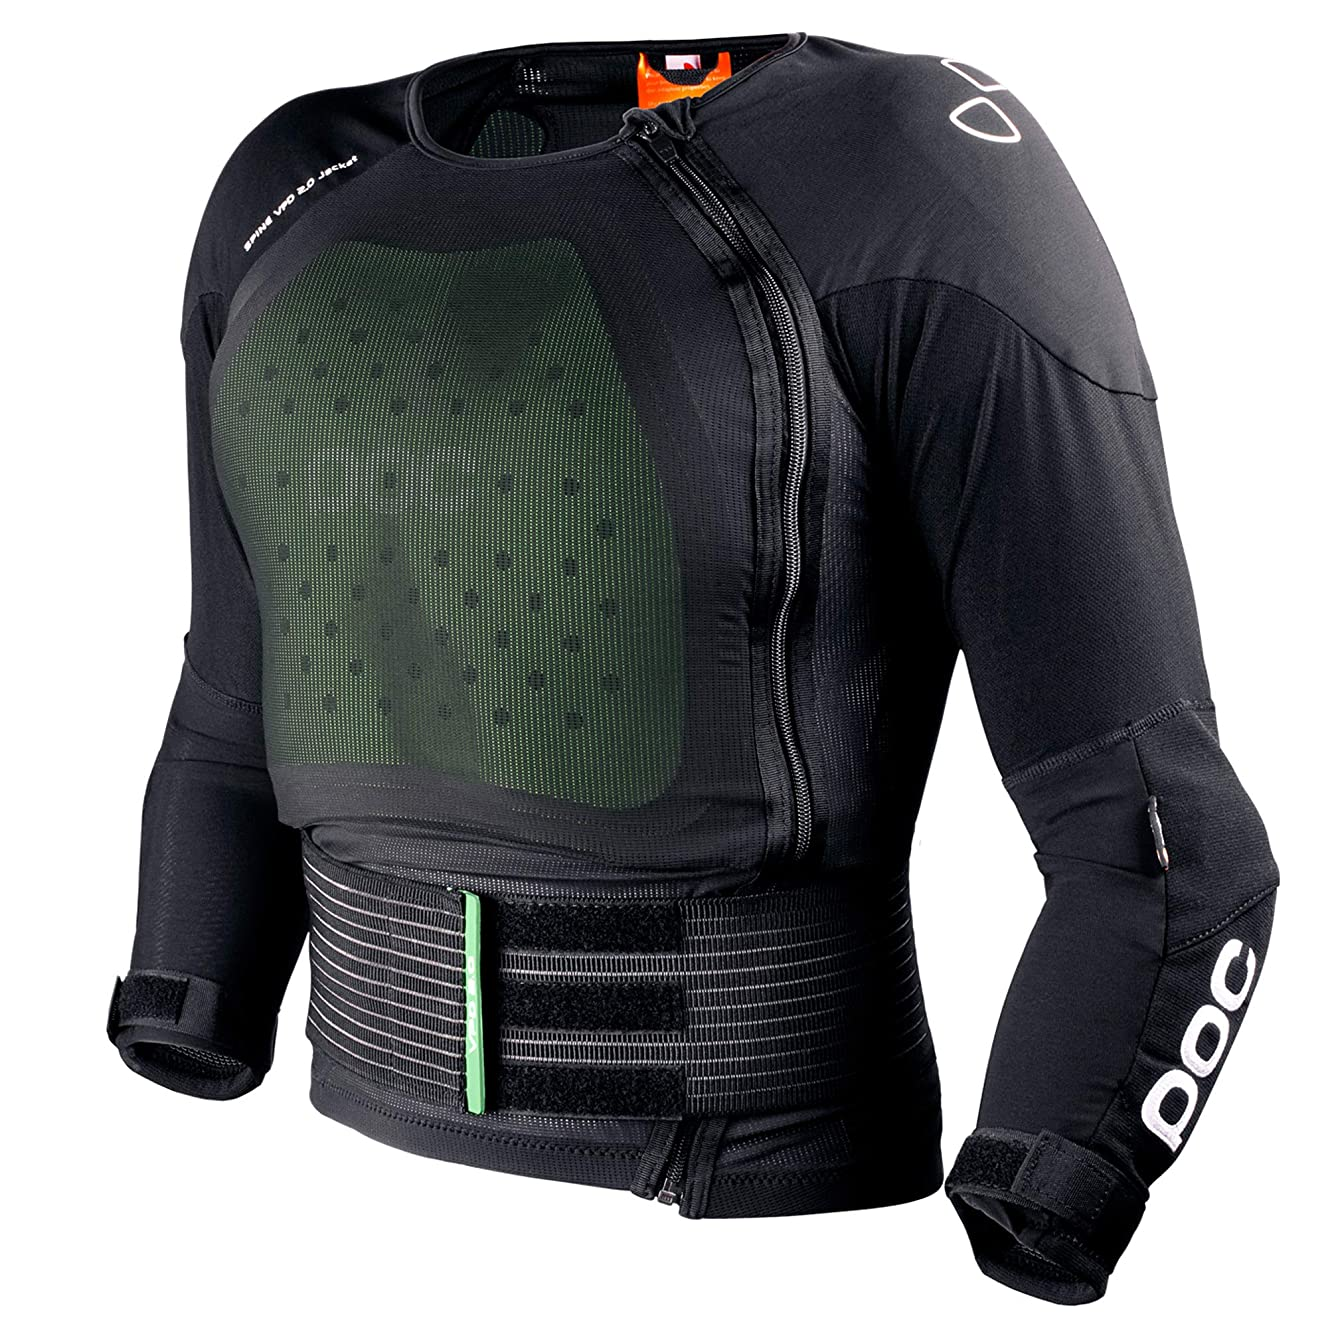 POC - Spine VPD 2.0 Vest, Mountain Biking Armor